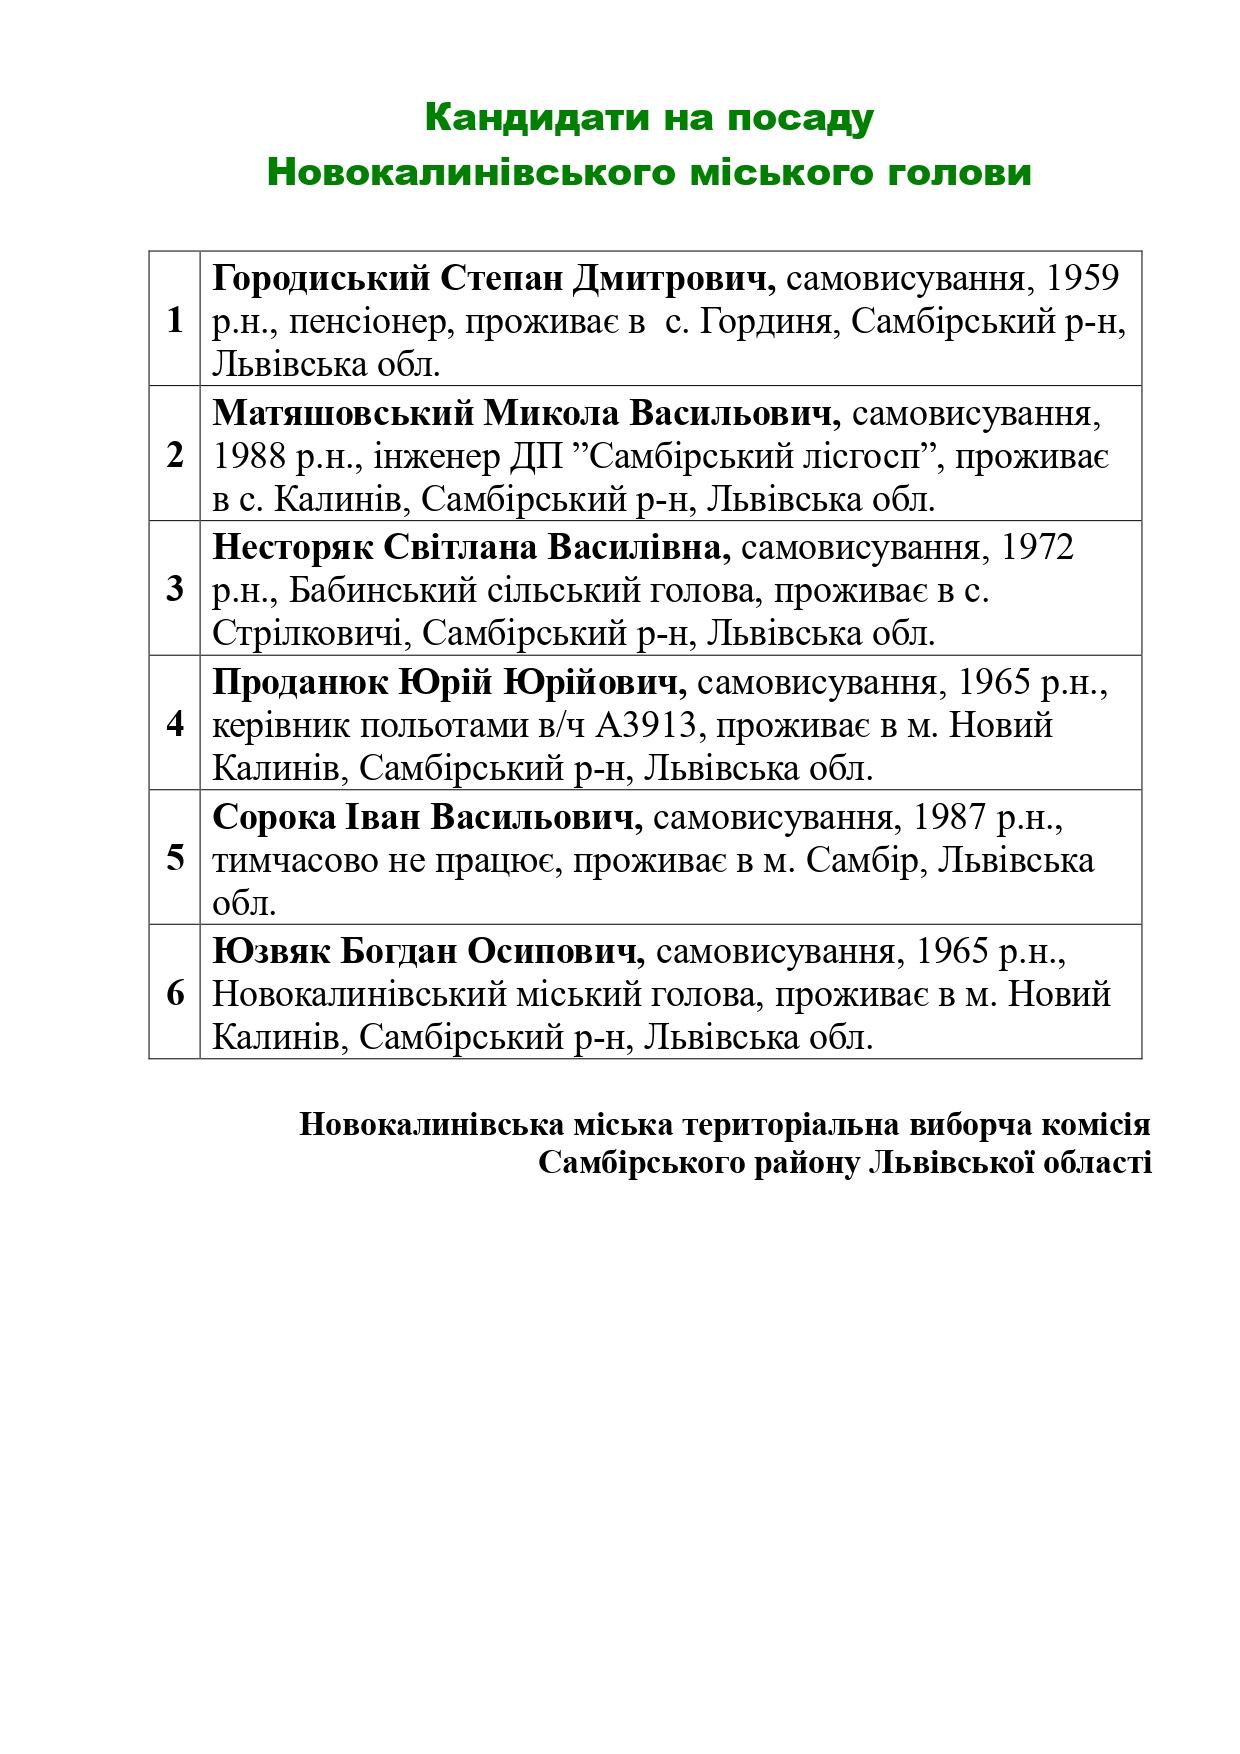 Novokalynivska miska terytorialna vyborcha komisiia informuie